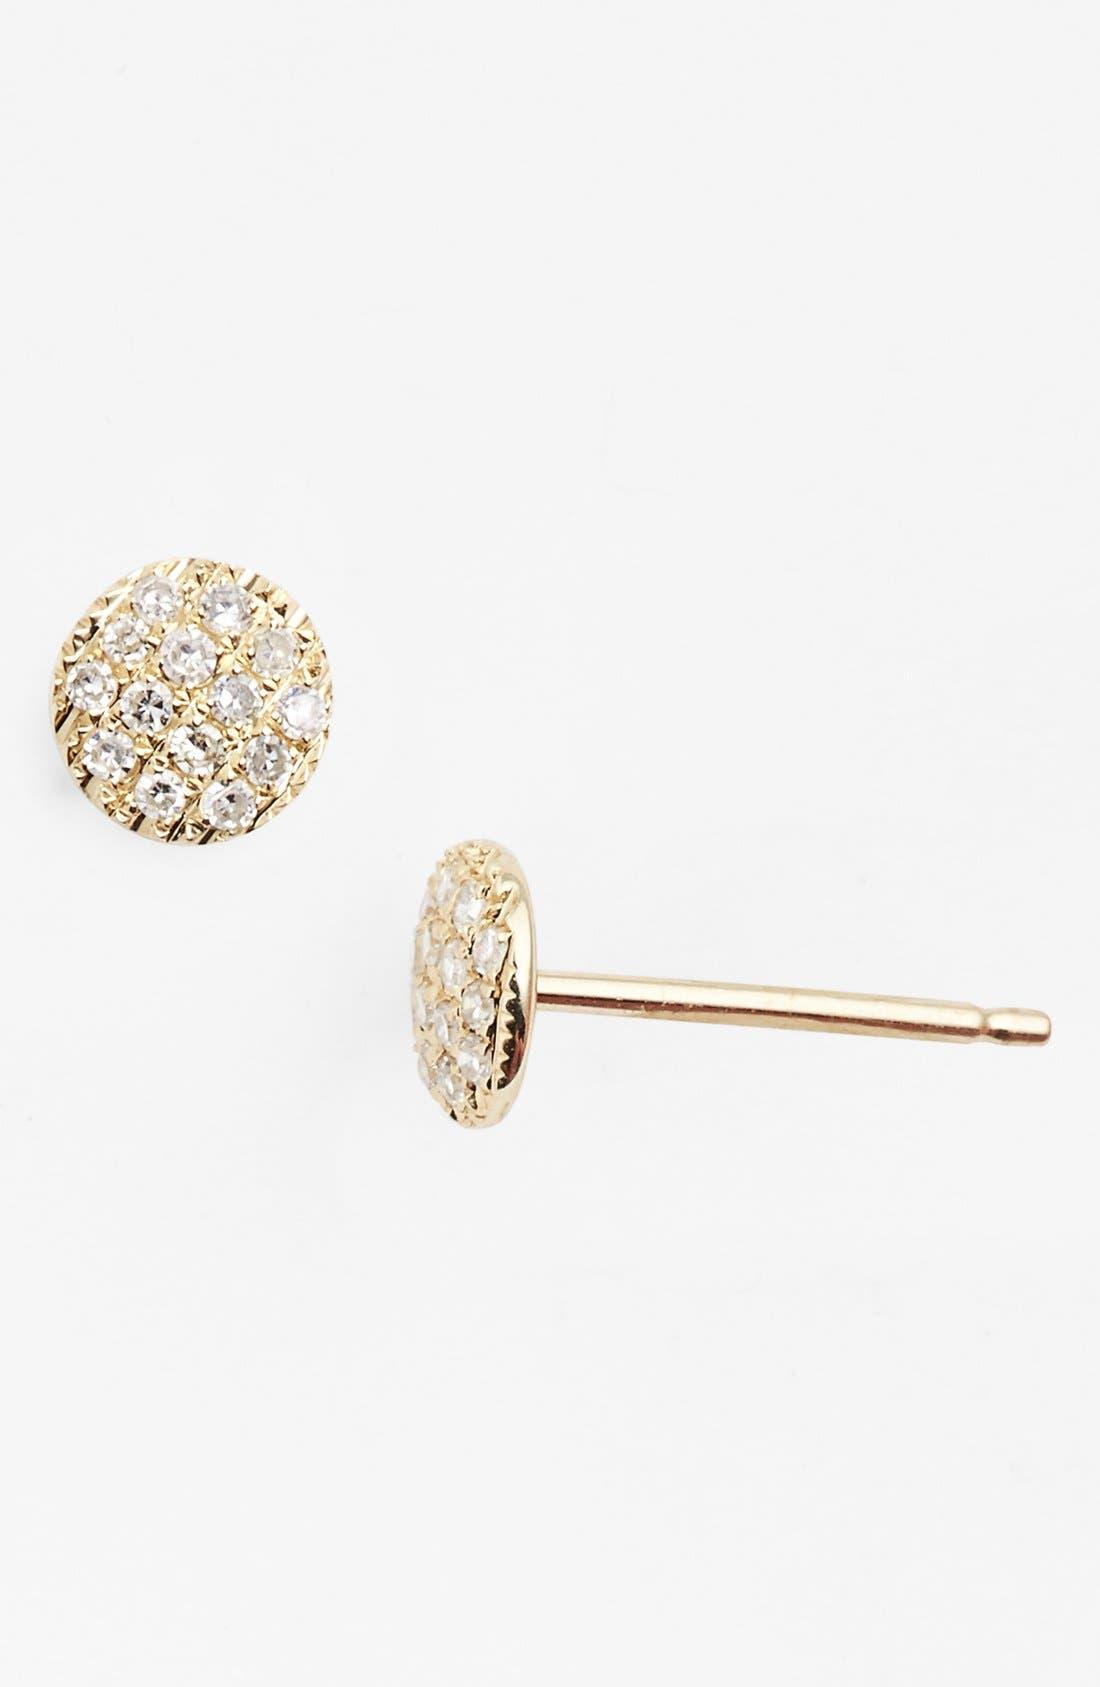 Main Image - Dana Rebecca Designs 'Lauren Joy' Diamond Disc Stud Earrings